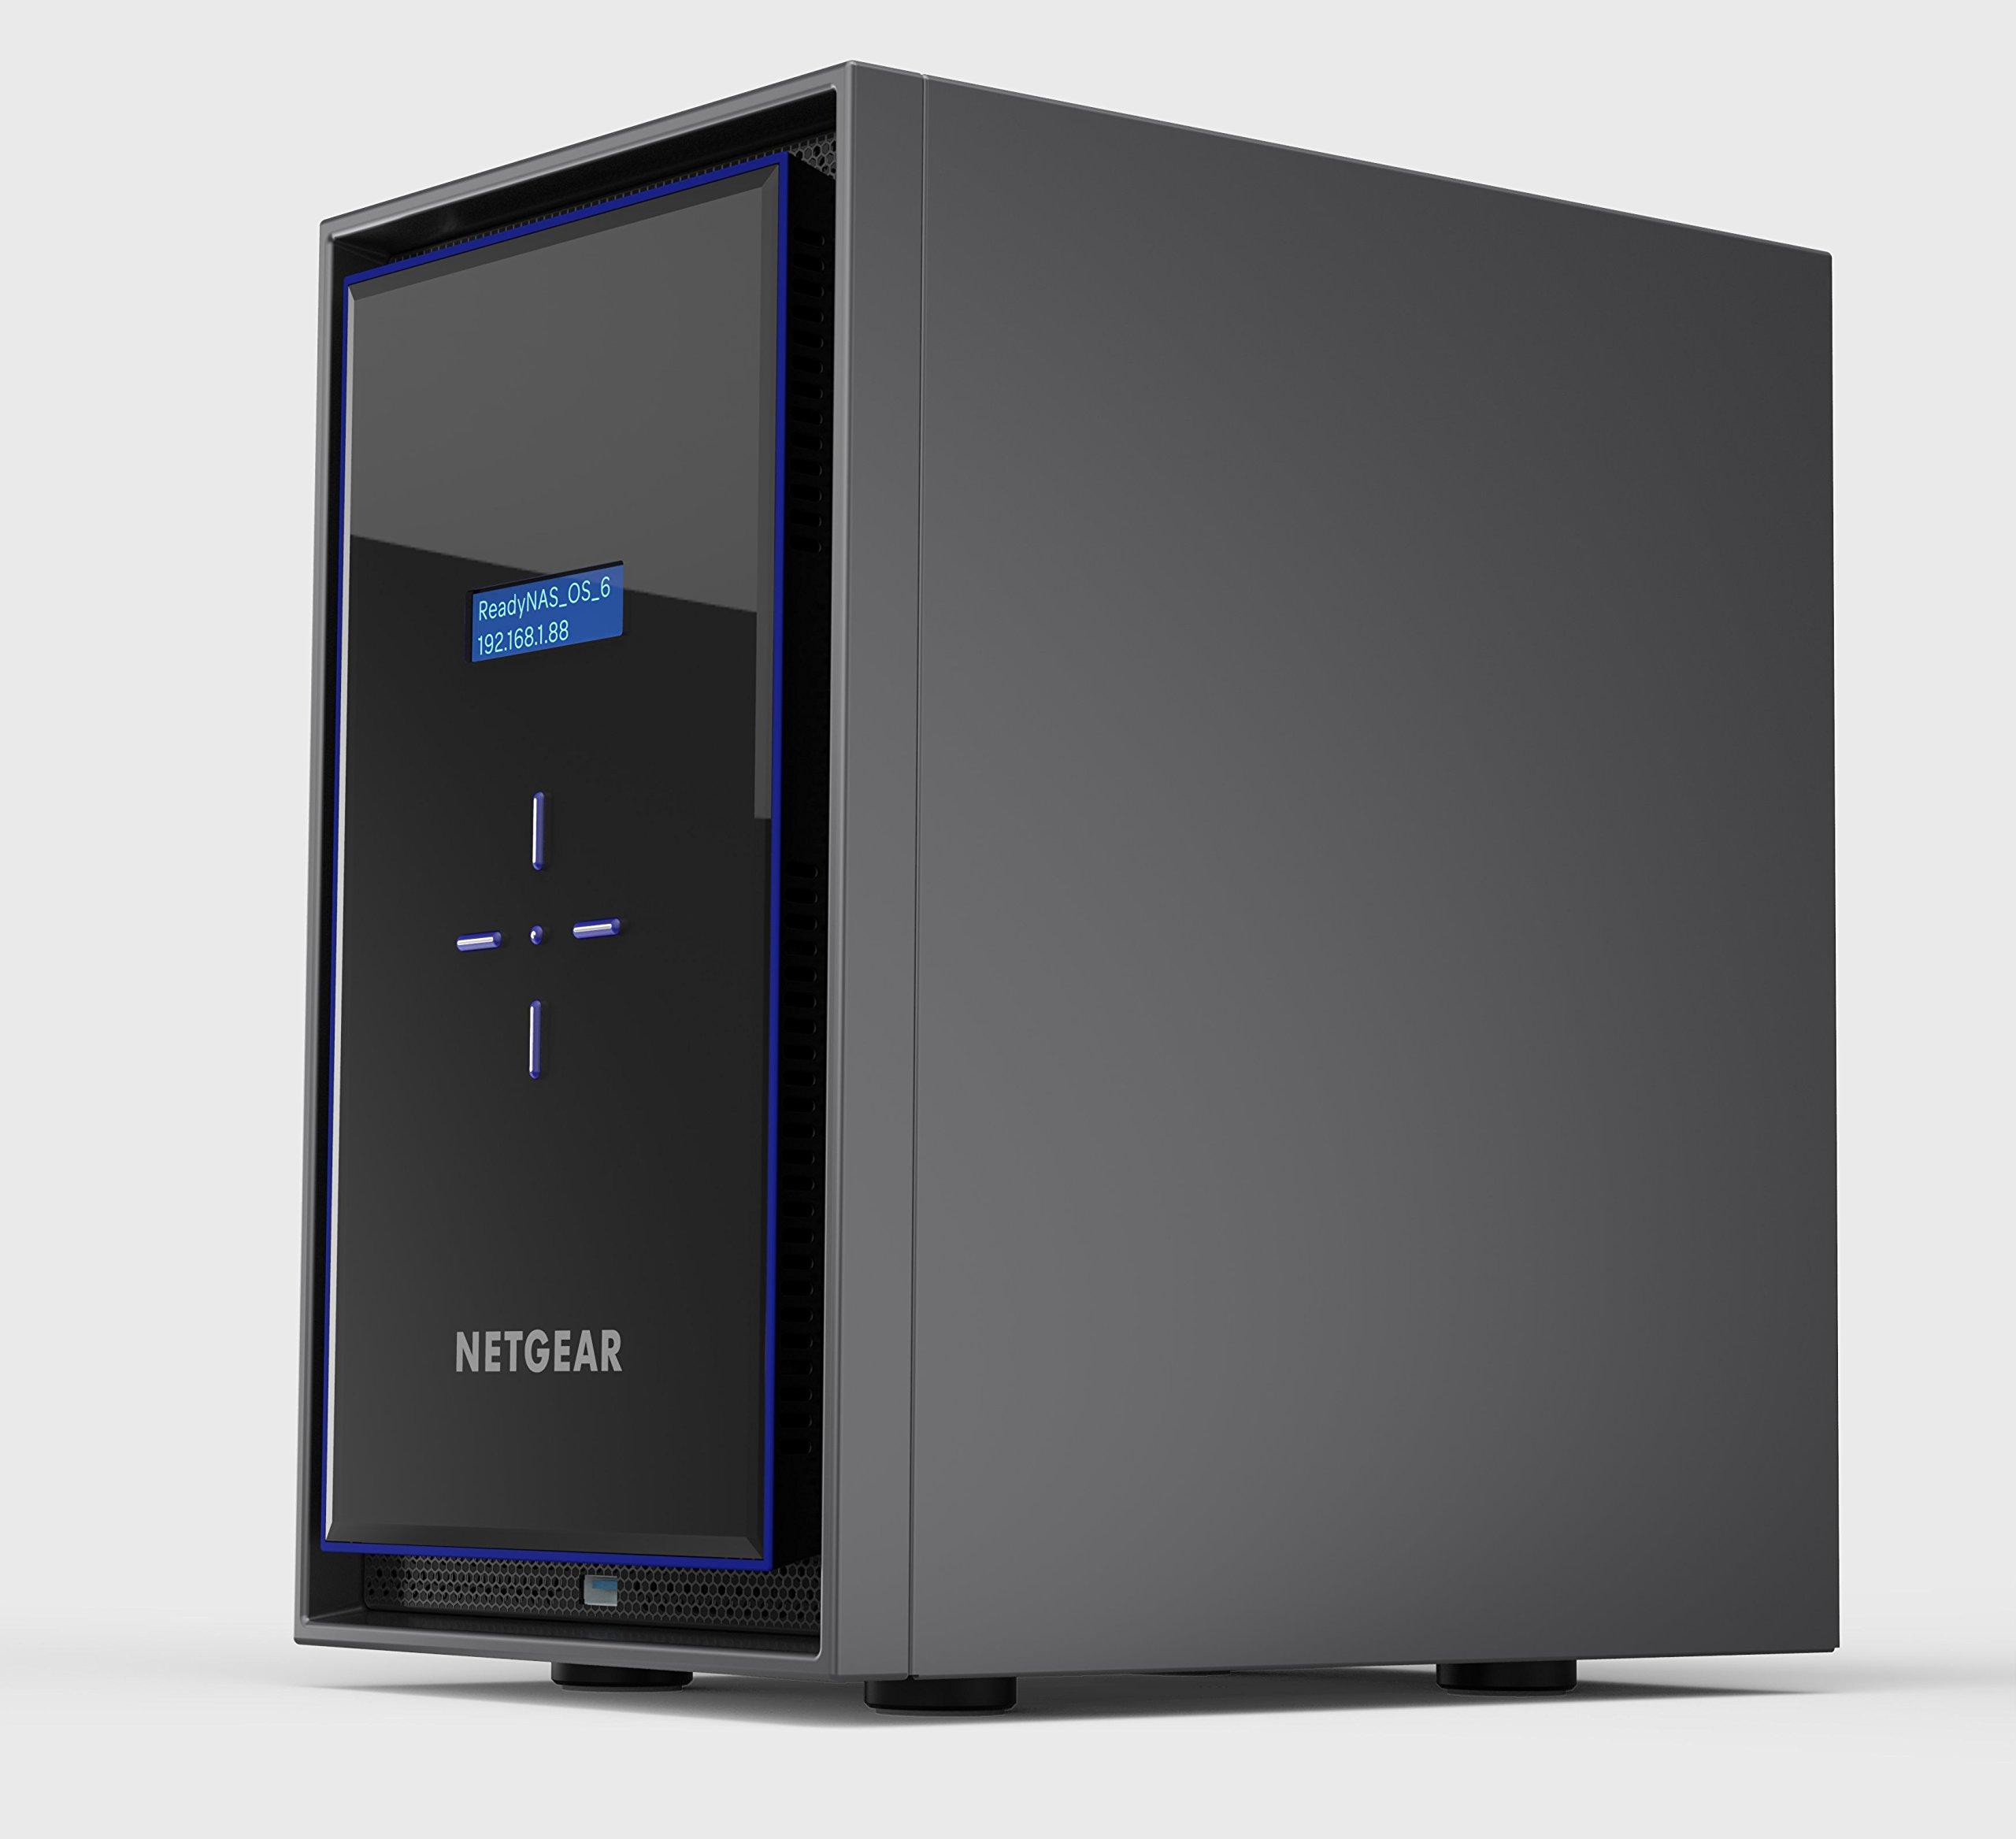 NETGEAR ReadyNAS RN428 8 Bay Diskless High Performance NAS, 80TB Capacity Network Attached Storage, Intel 2.1GHz Quad Core Processor, 4GB RAM, (RN42800) by NETGEAR (Image #2)